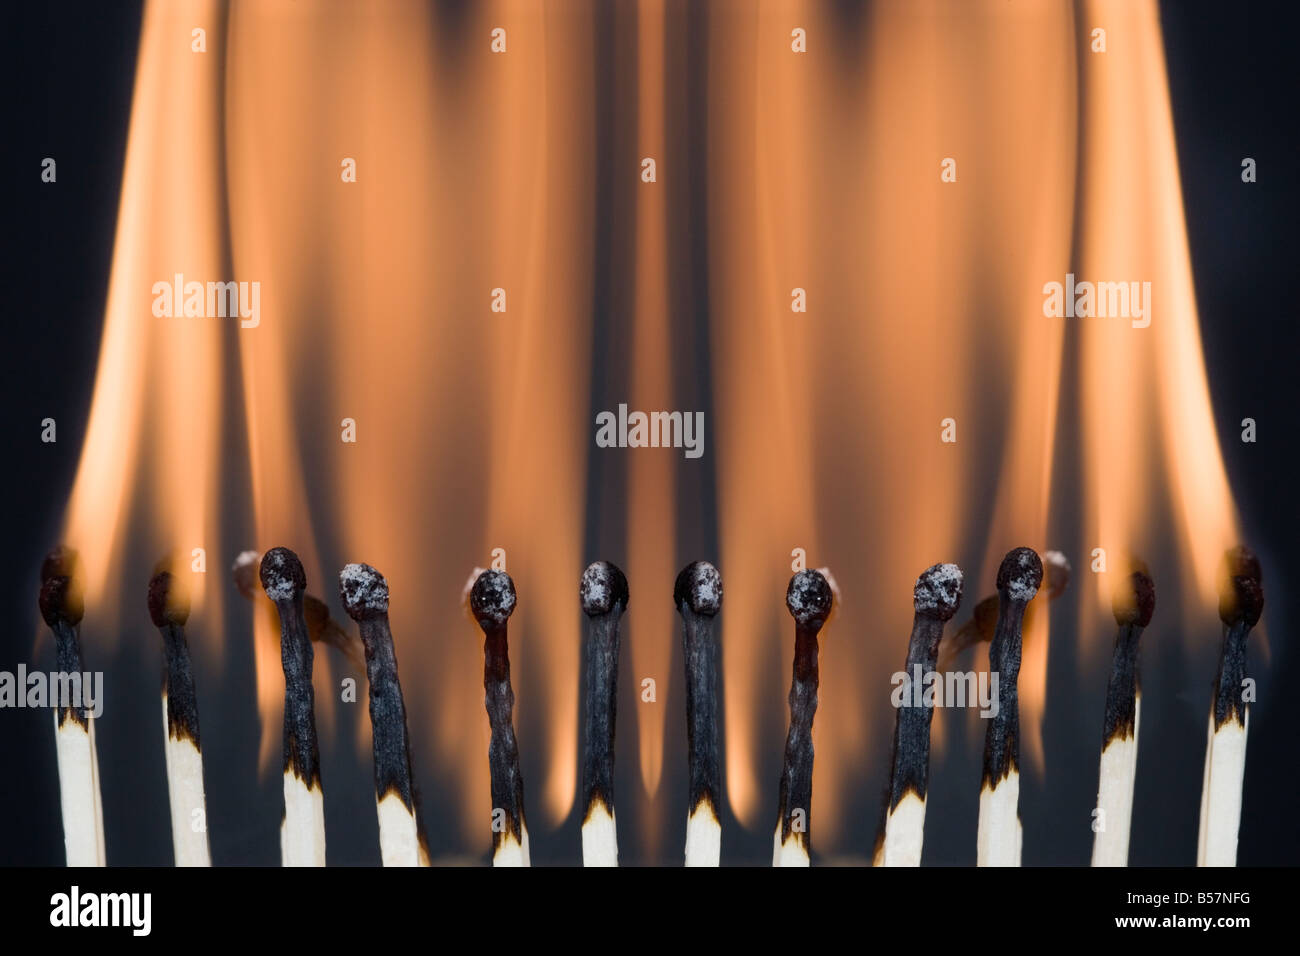 Row of burning matches - Stock Image